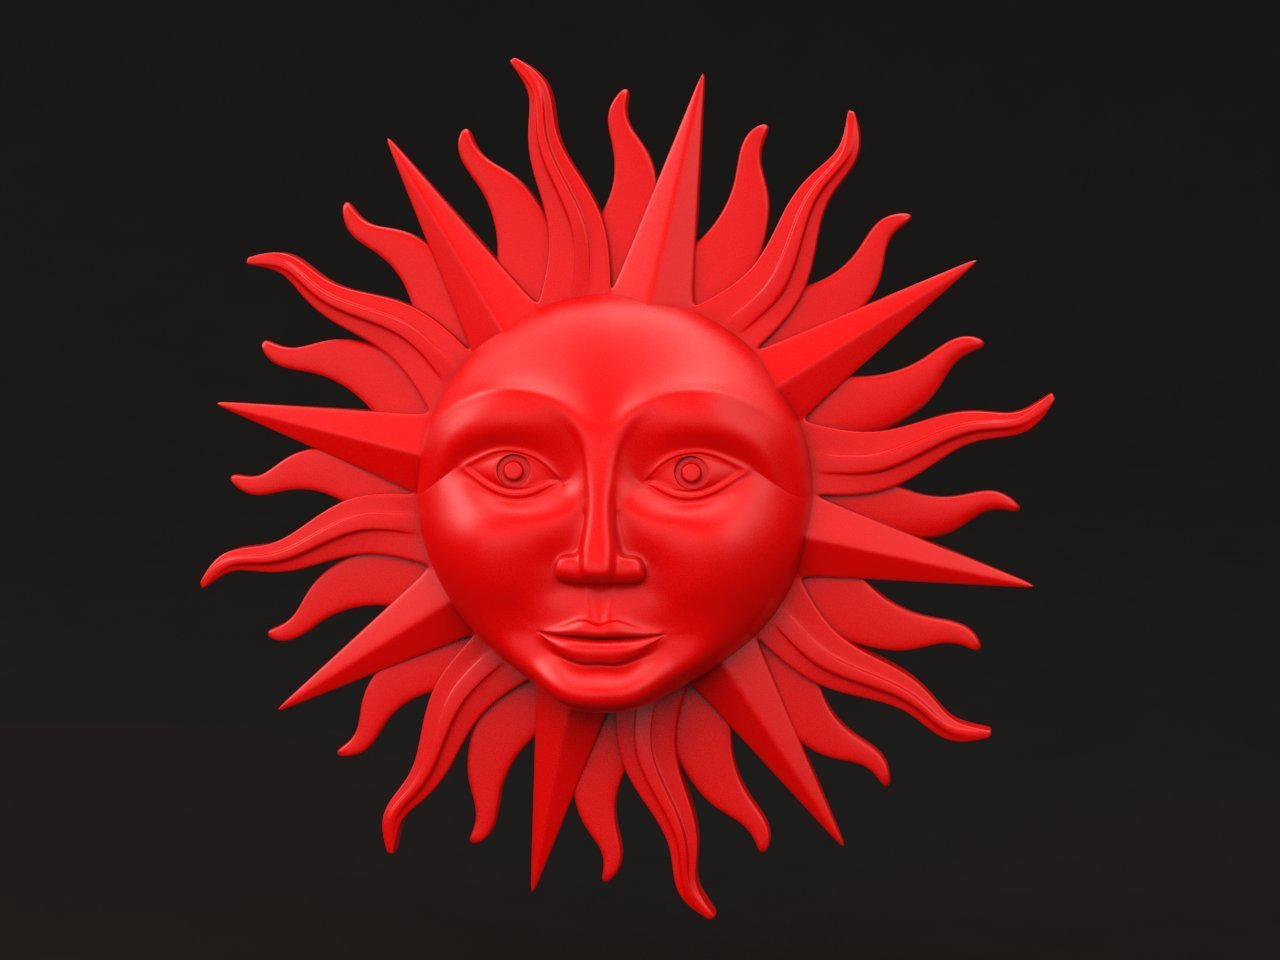 sun_red.jpg Download STL file sun • 3D printing model, iradj3d